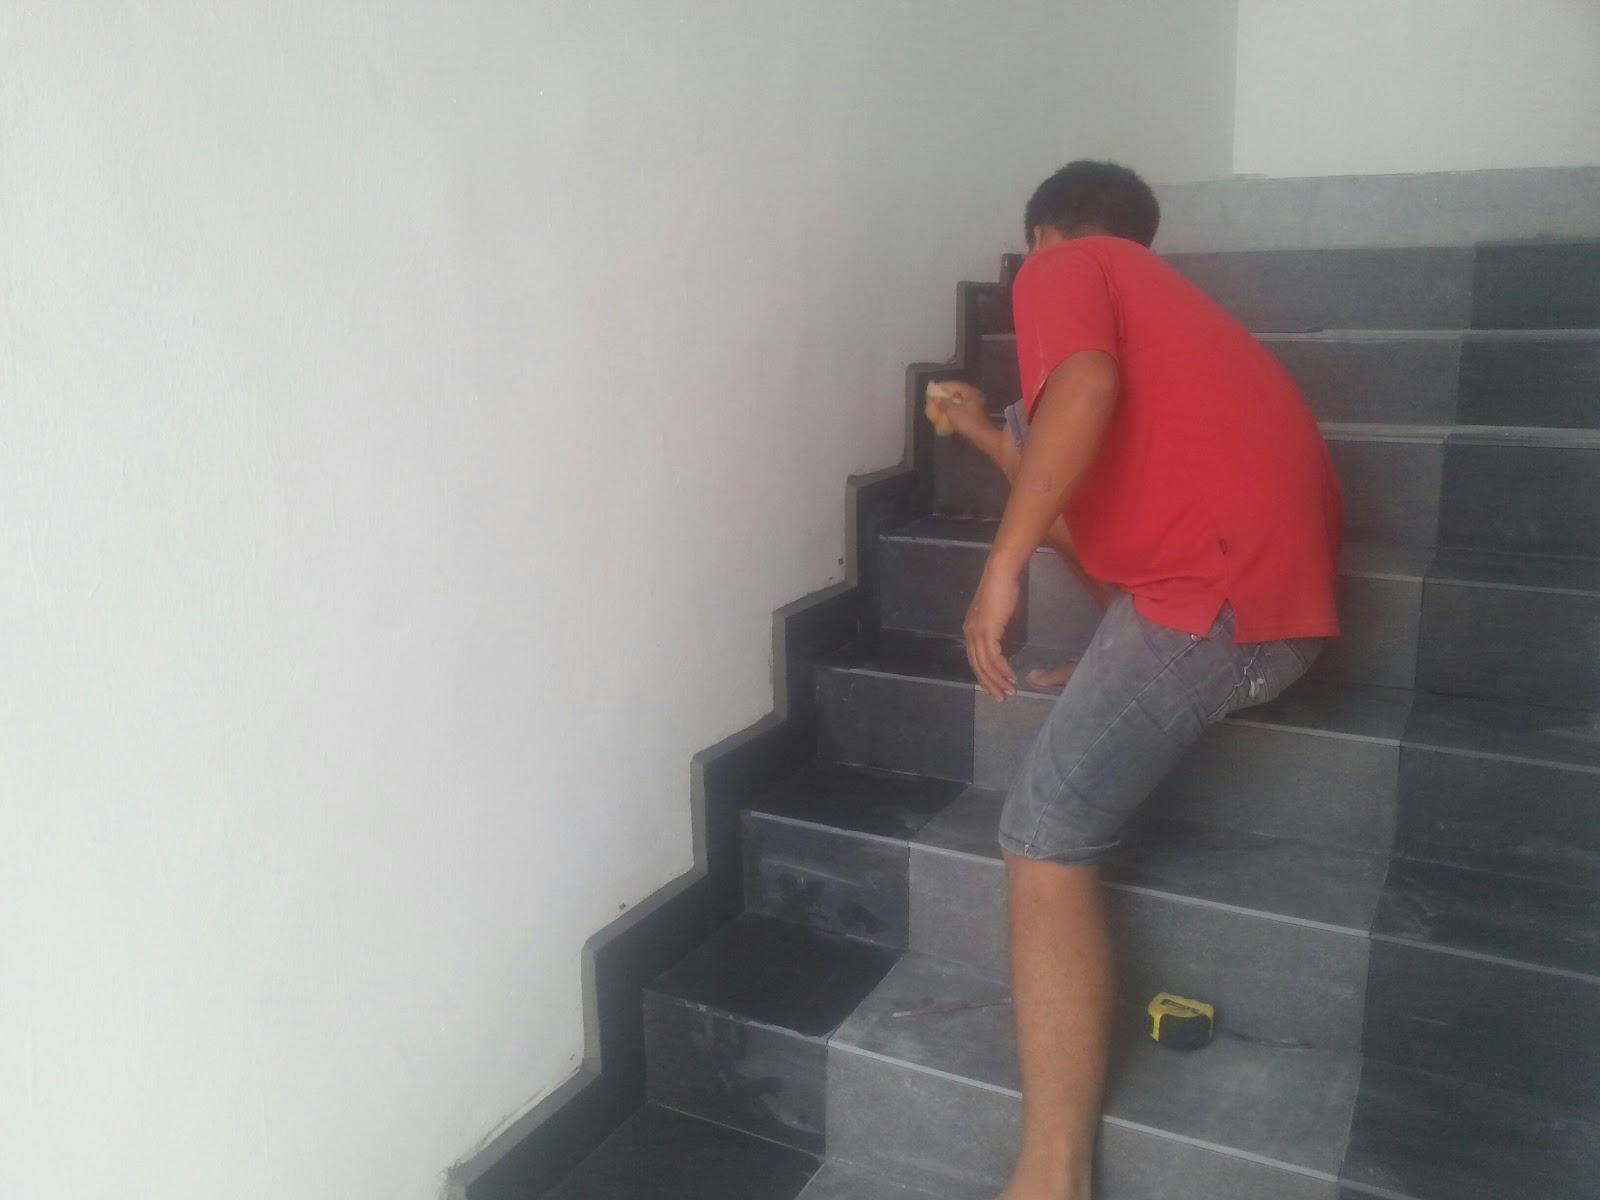 Kerja Memasang Tiles Kat Tangga Yang 1 2 Kaki Dengan Jenis Warna Dan Lantai Menggunakan